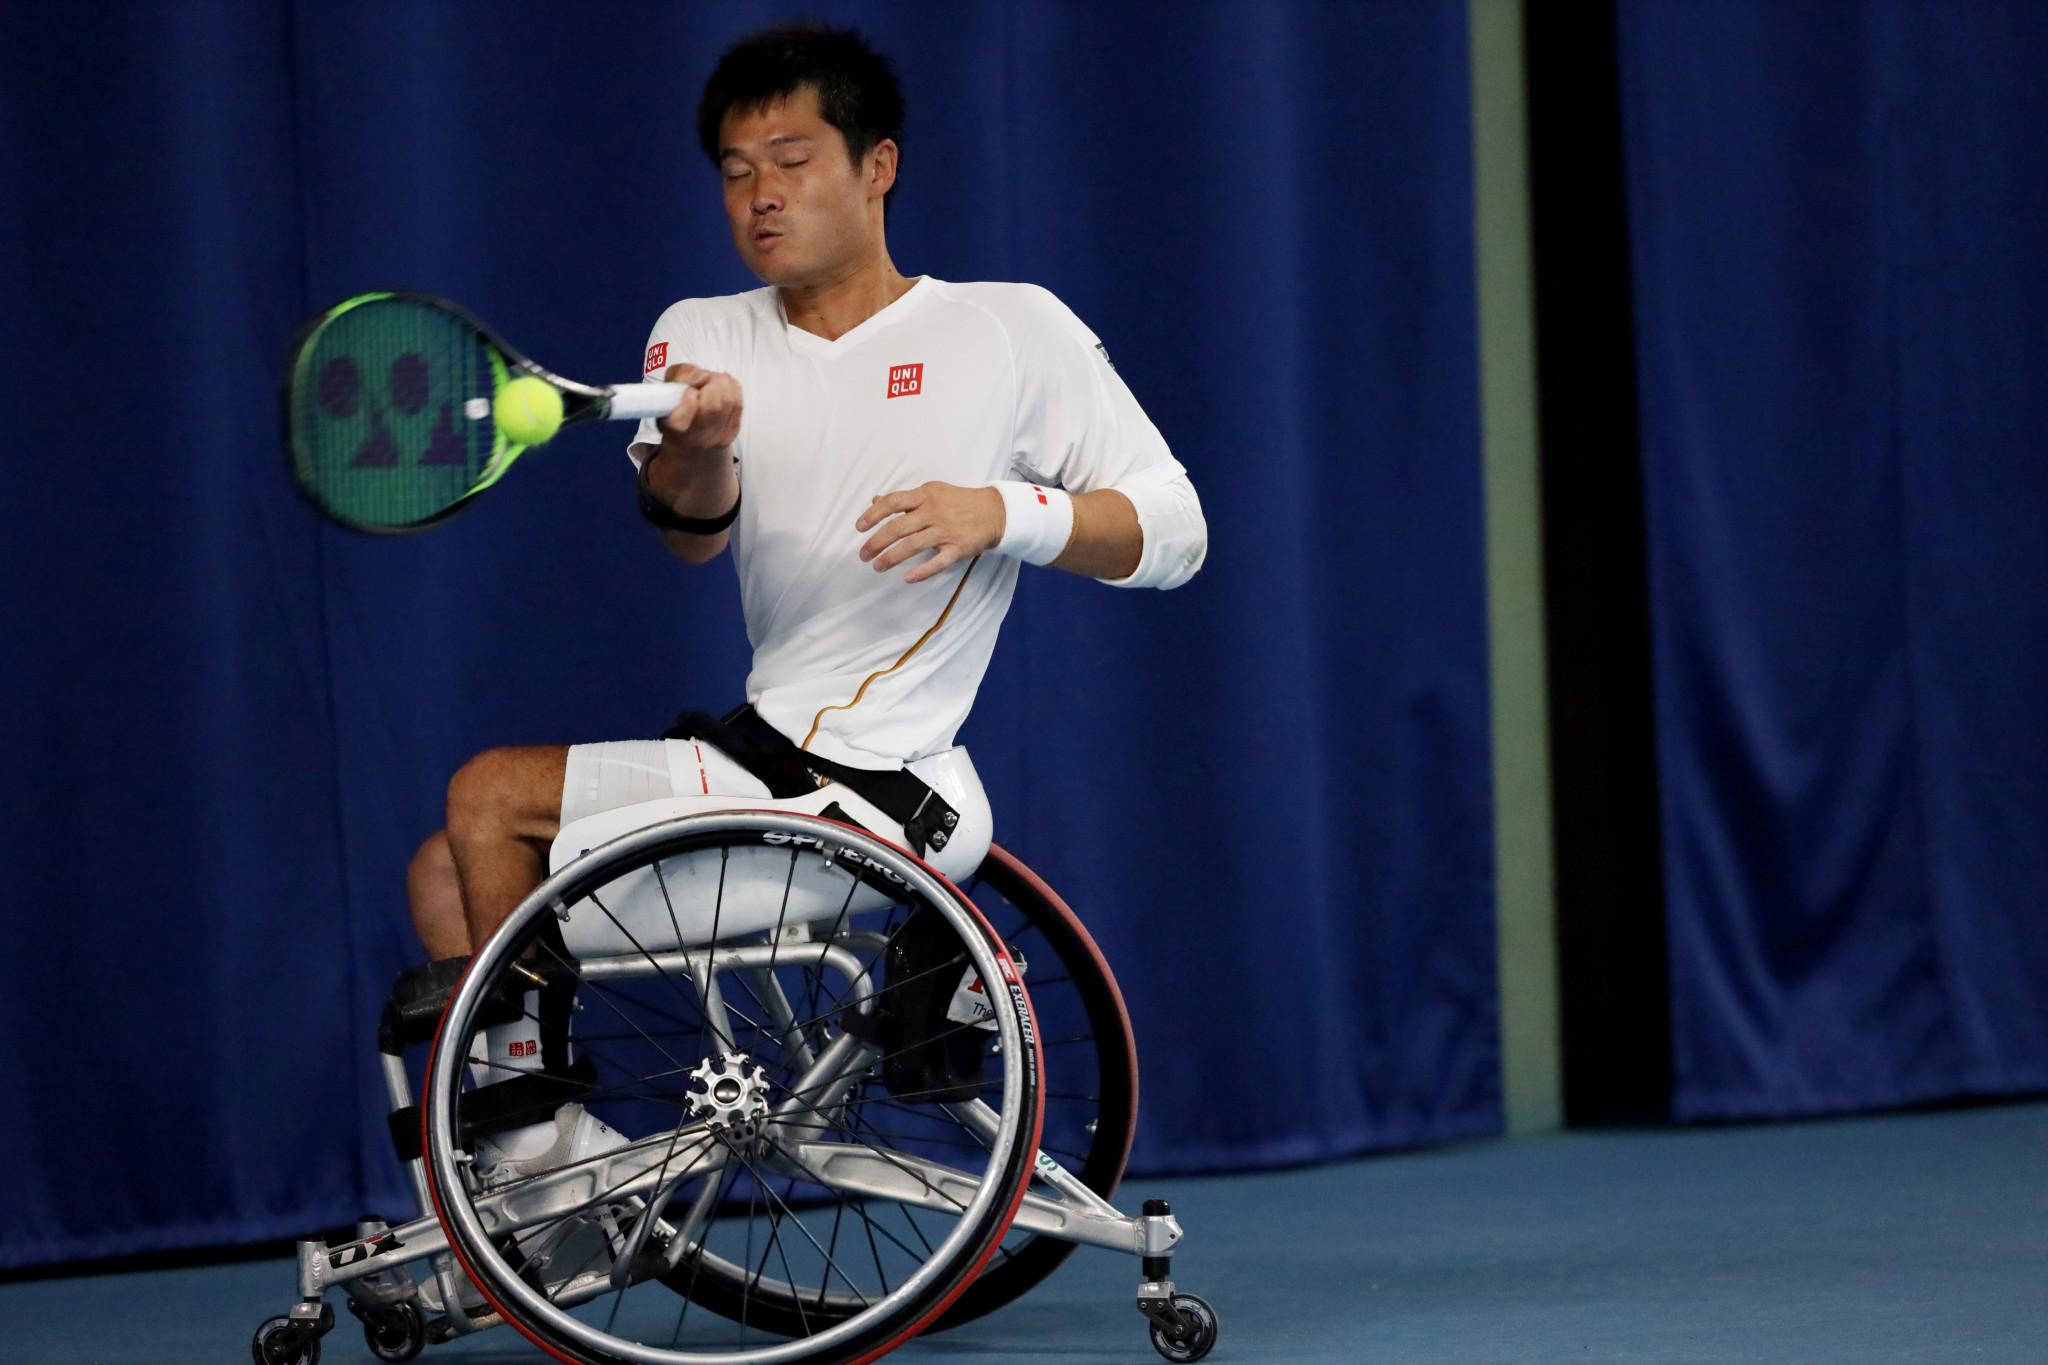 Top seed Japan's Shingo Kunieda, headlines the men's singles field as wheelchair tennis begins at the US Open ©Getty Images